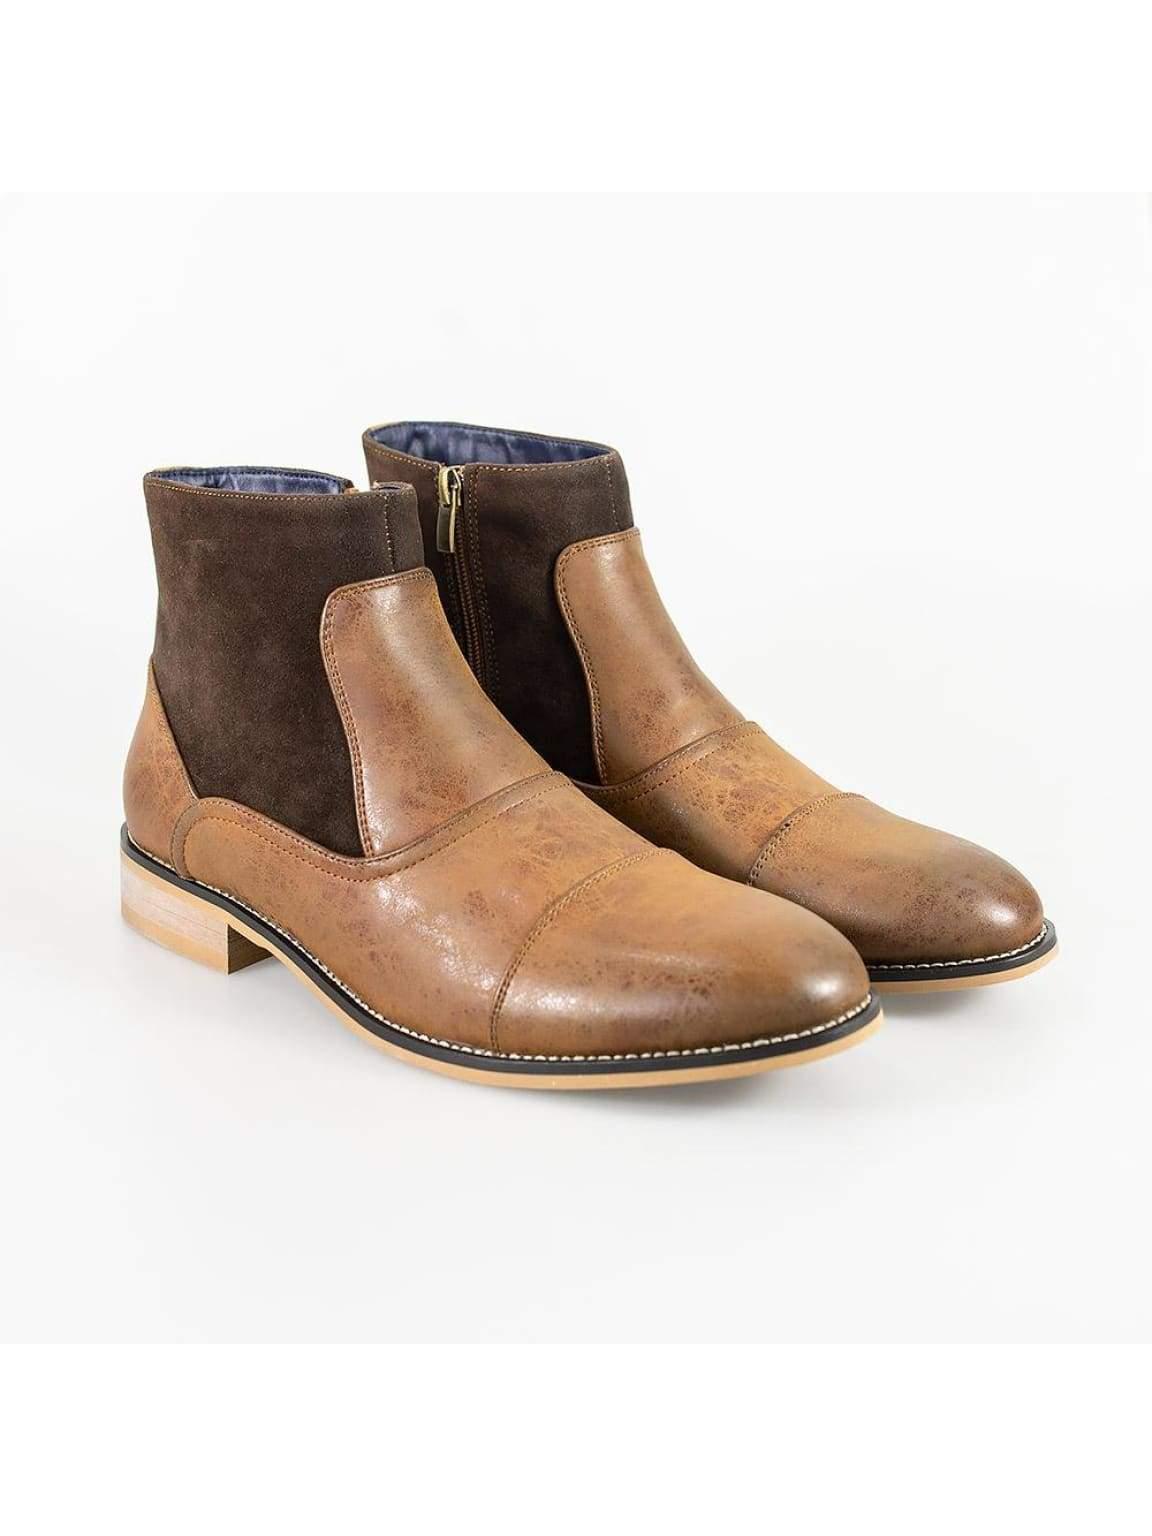 Cavani Halifax Brown Mens Leather Boots - UK6 | EU41 - Boots